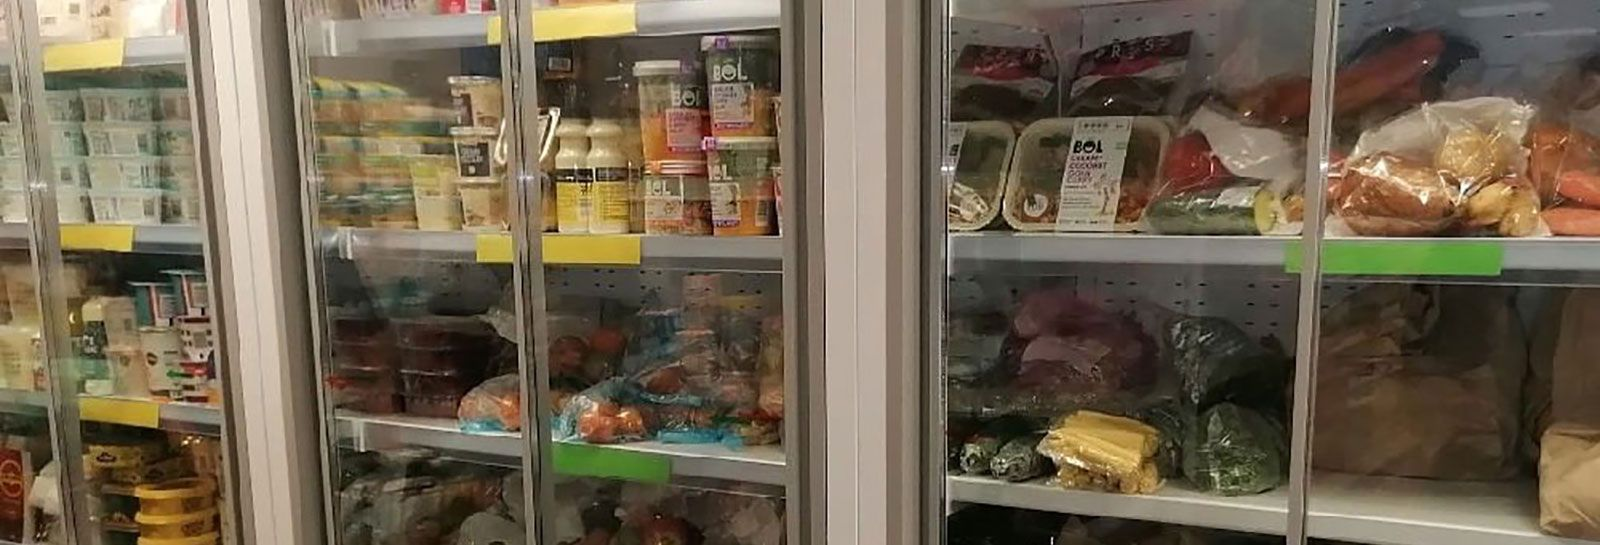 Food fridges at the Scottish Pantry Network banner image